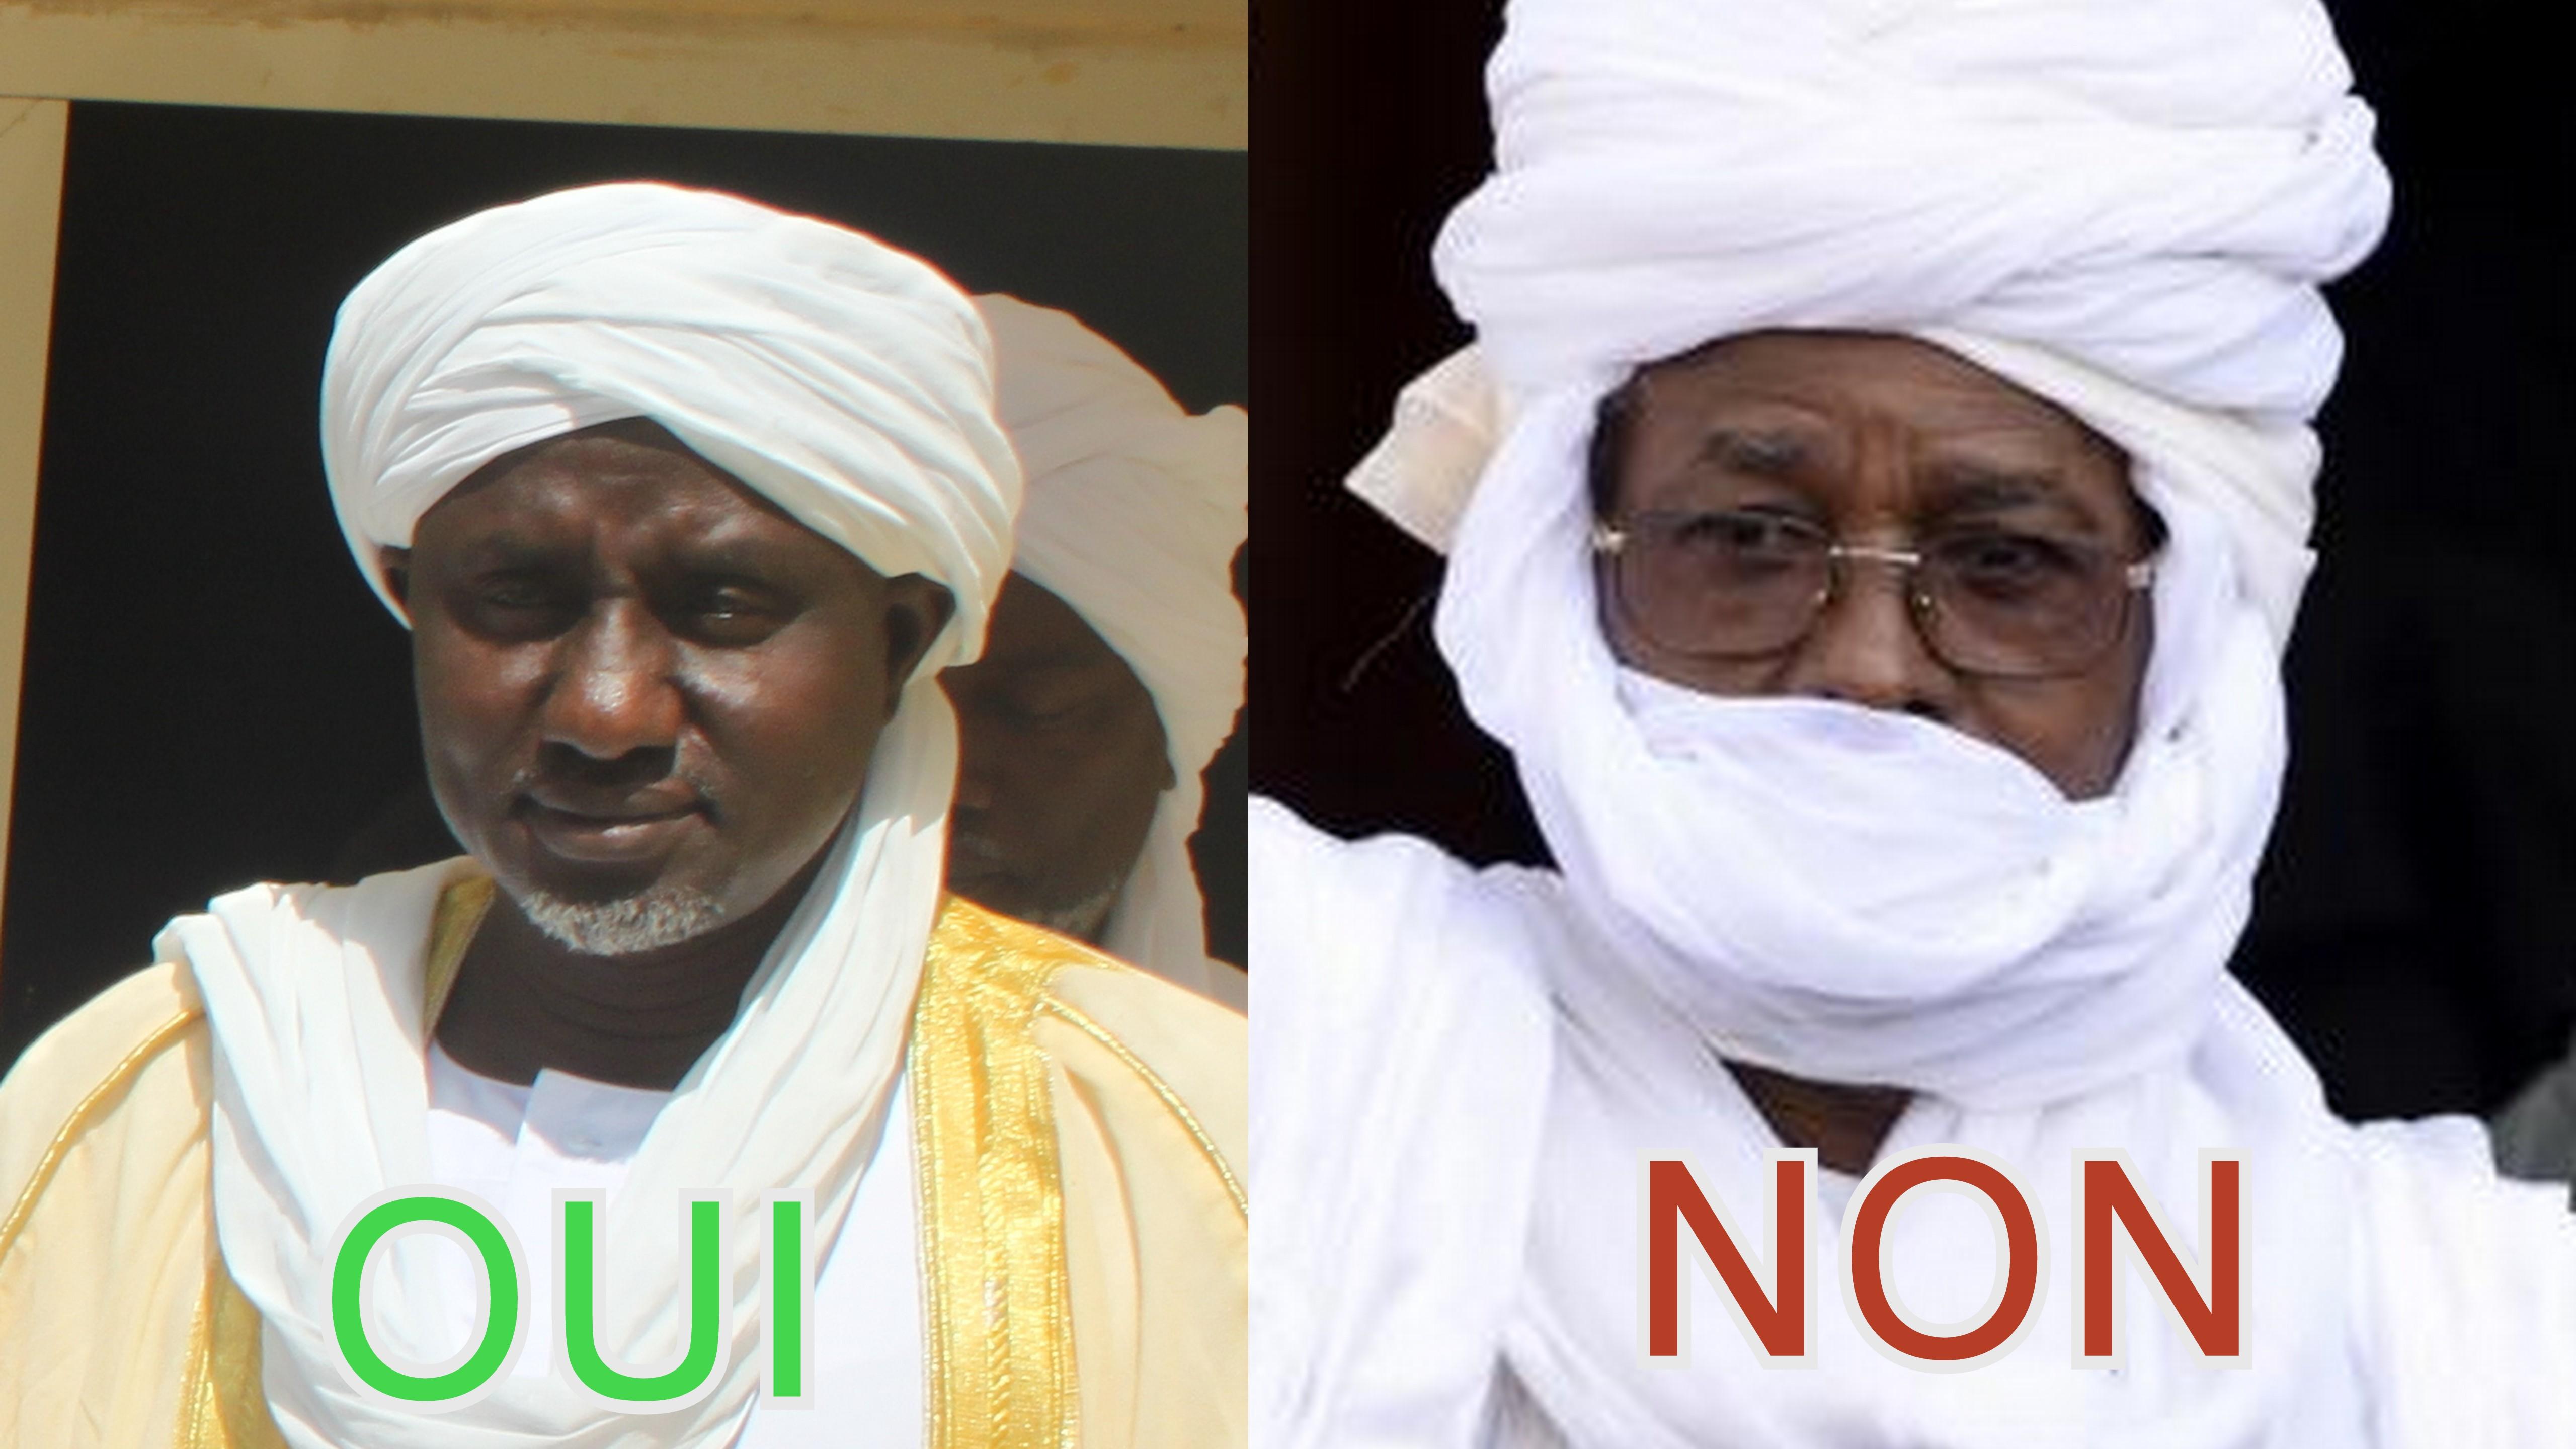 Tchad : interdiction de porter la burqua et le turban complet (Kadamoul)